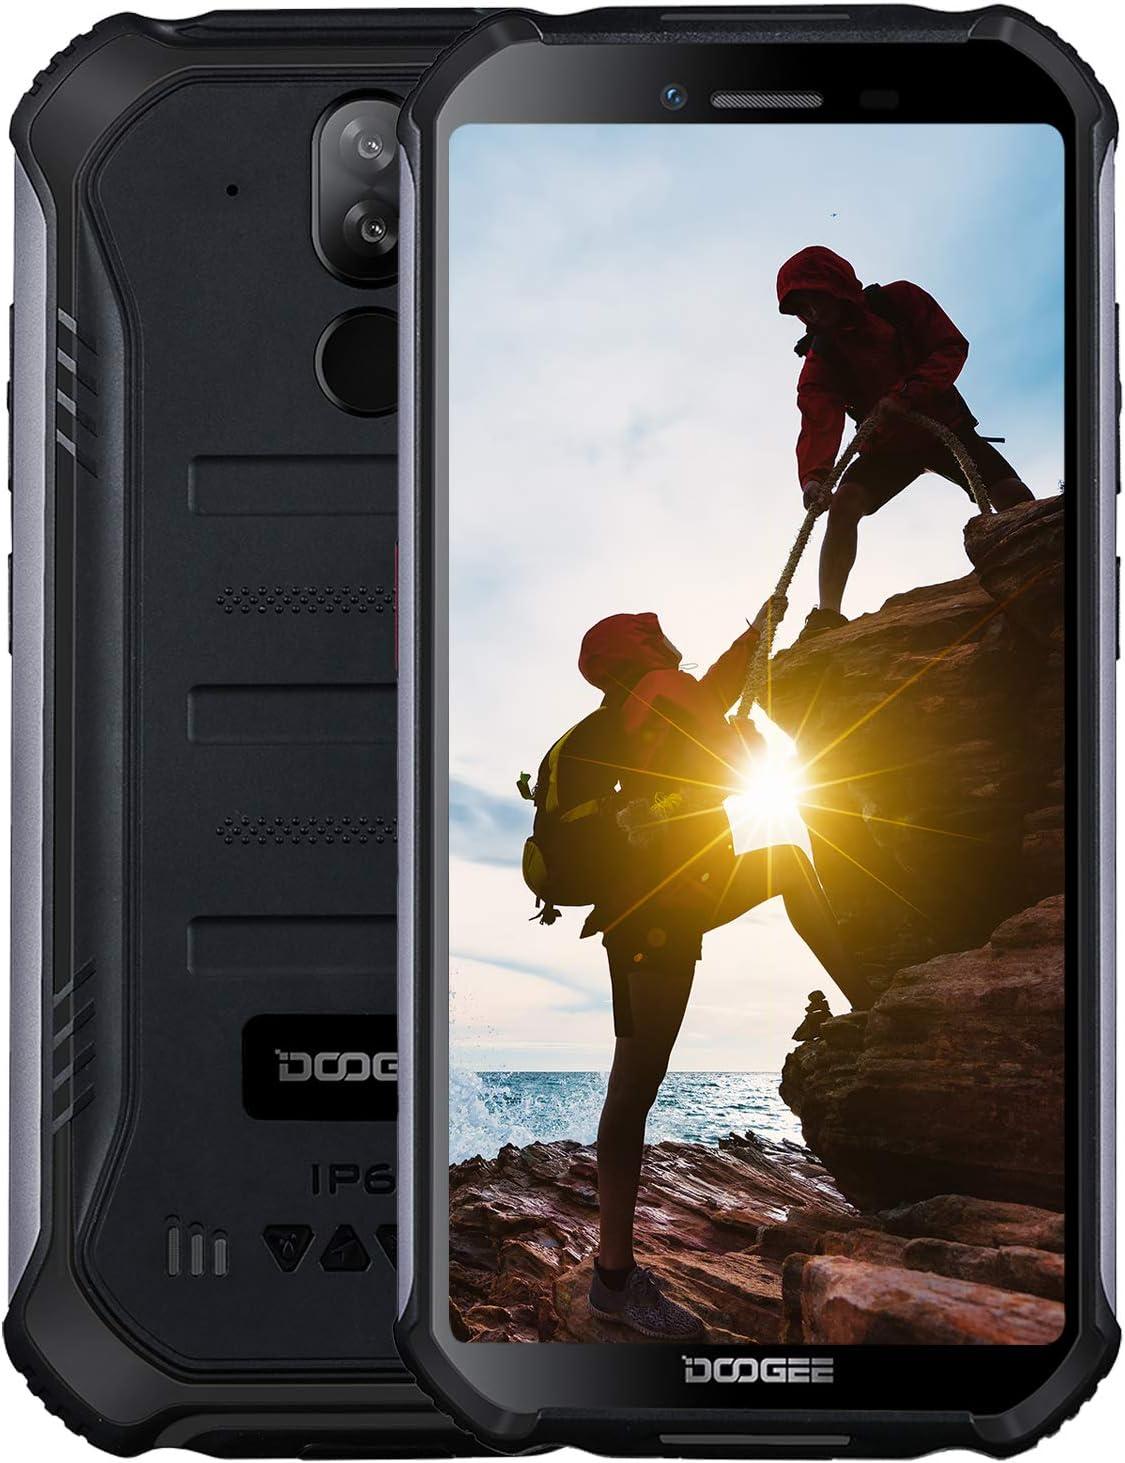 DOOGEE S40 Telefonos Moviles Libres 4G Antigolpes IP68/IP69K ...